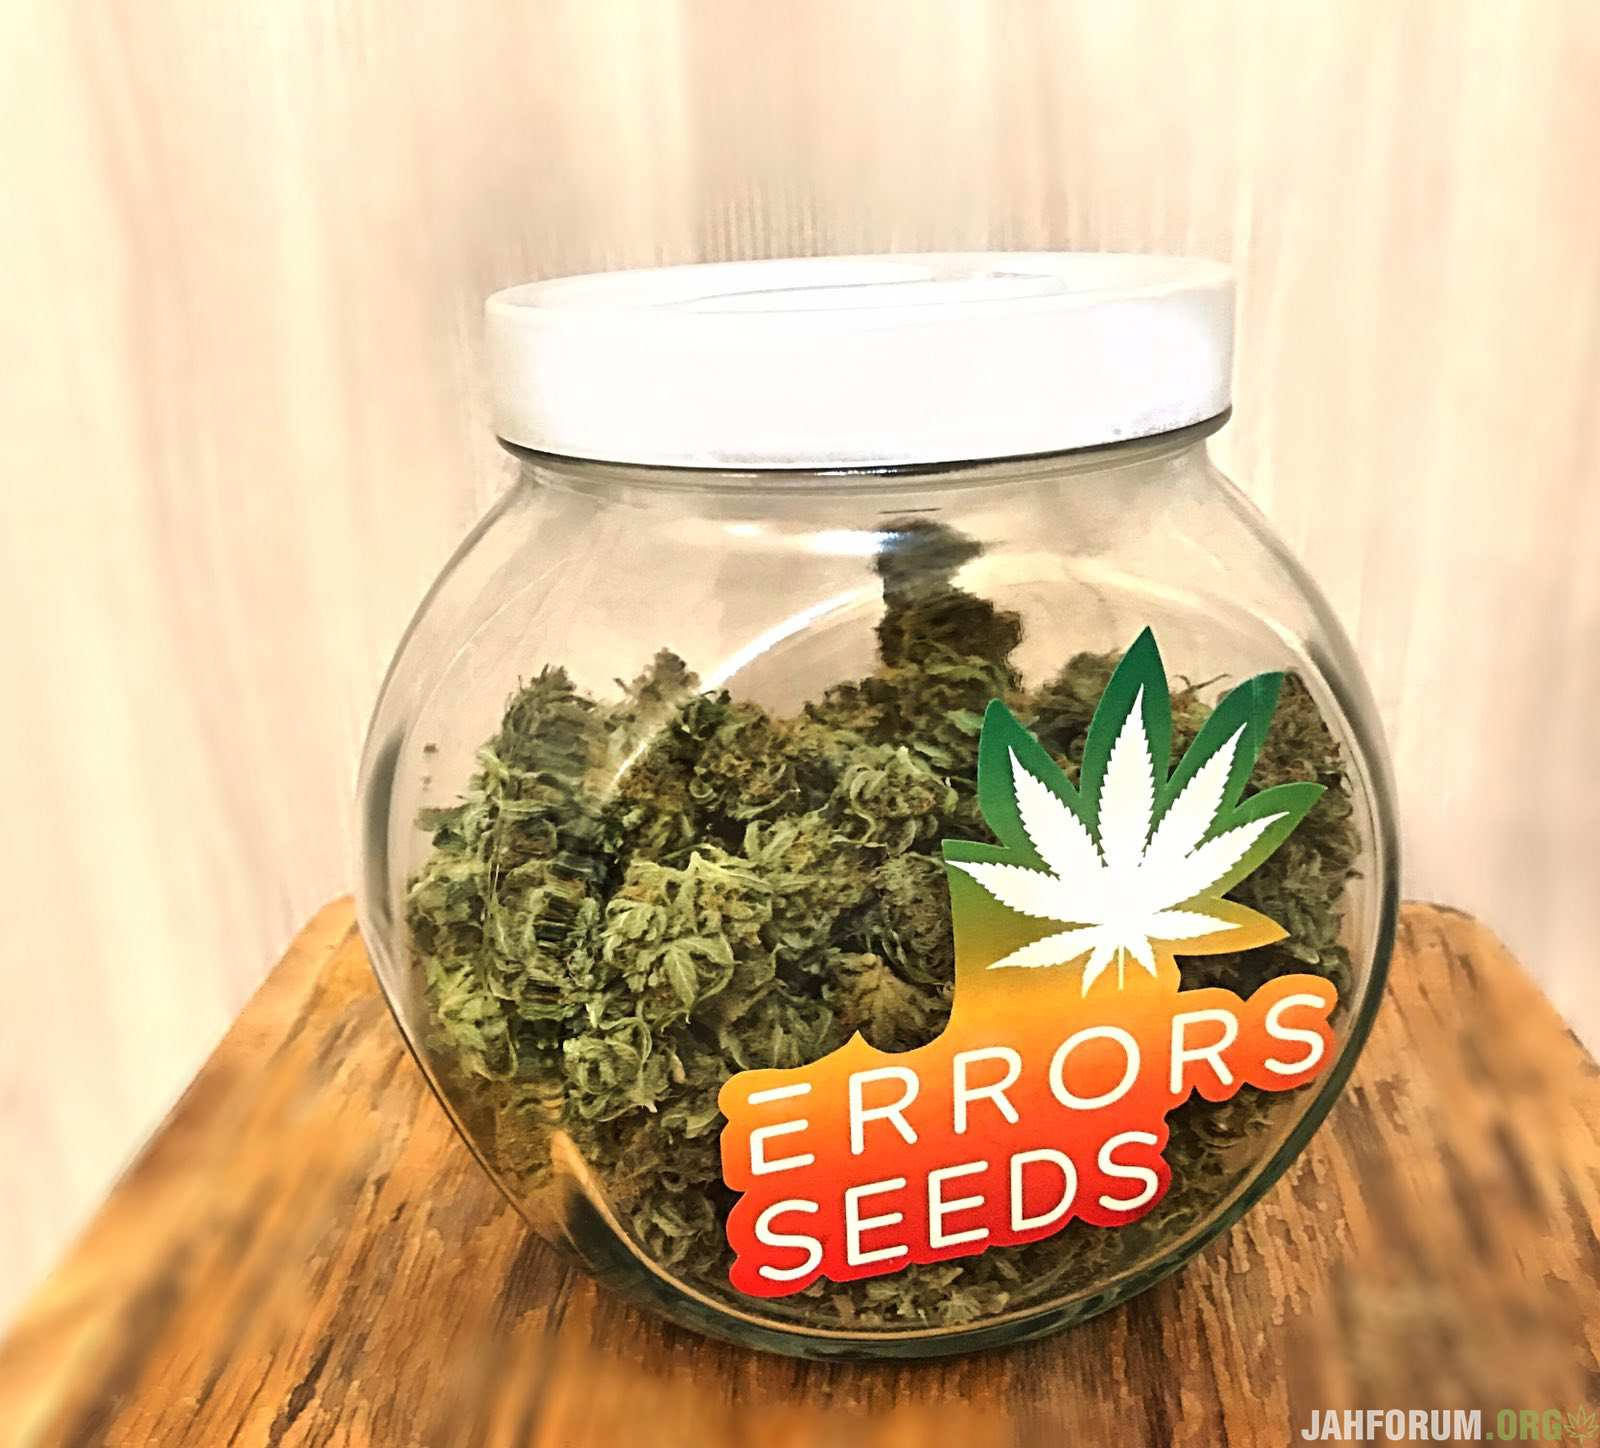 Errors Seeds